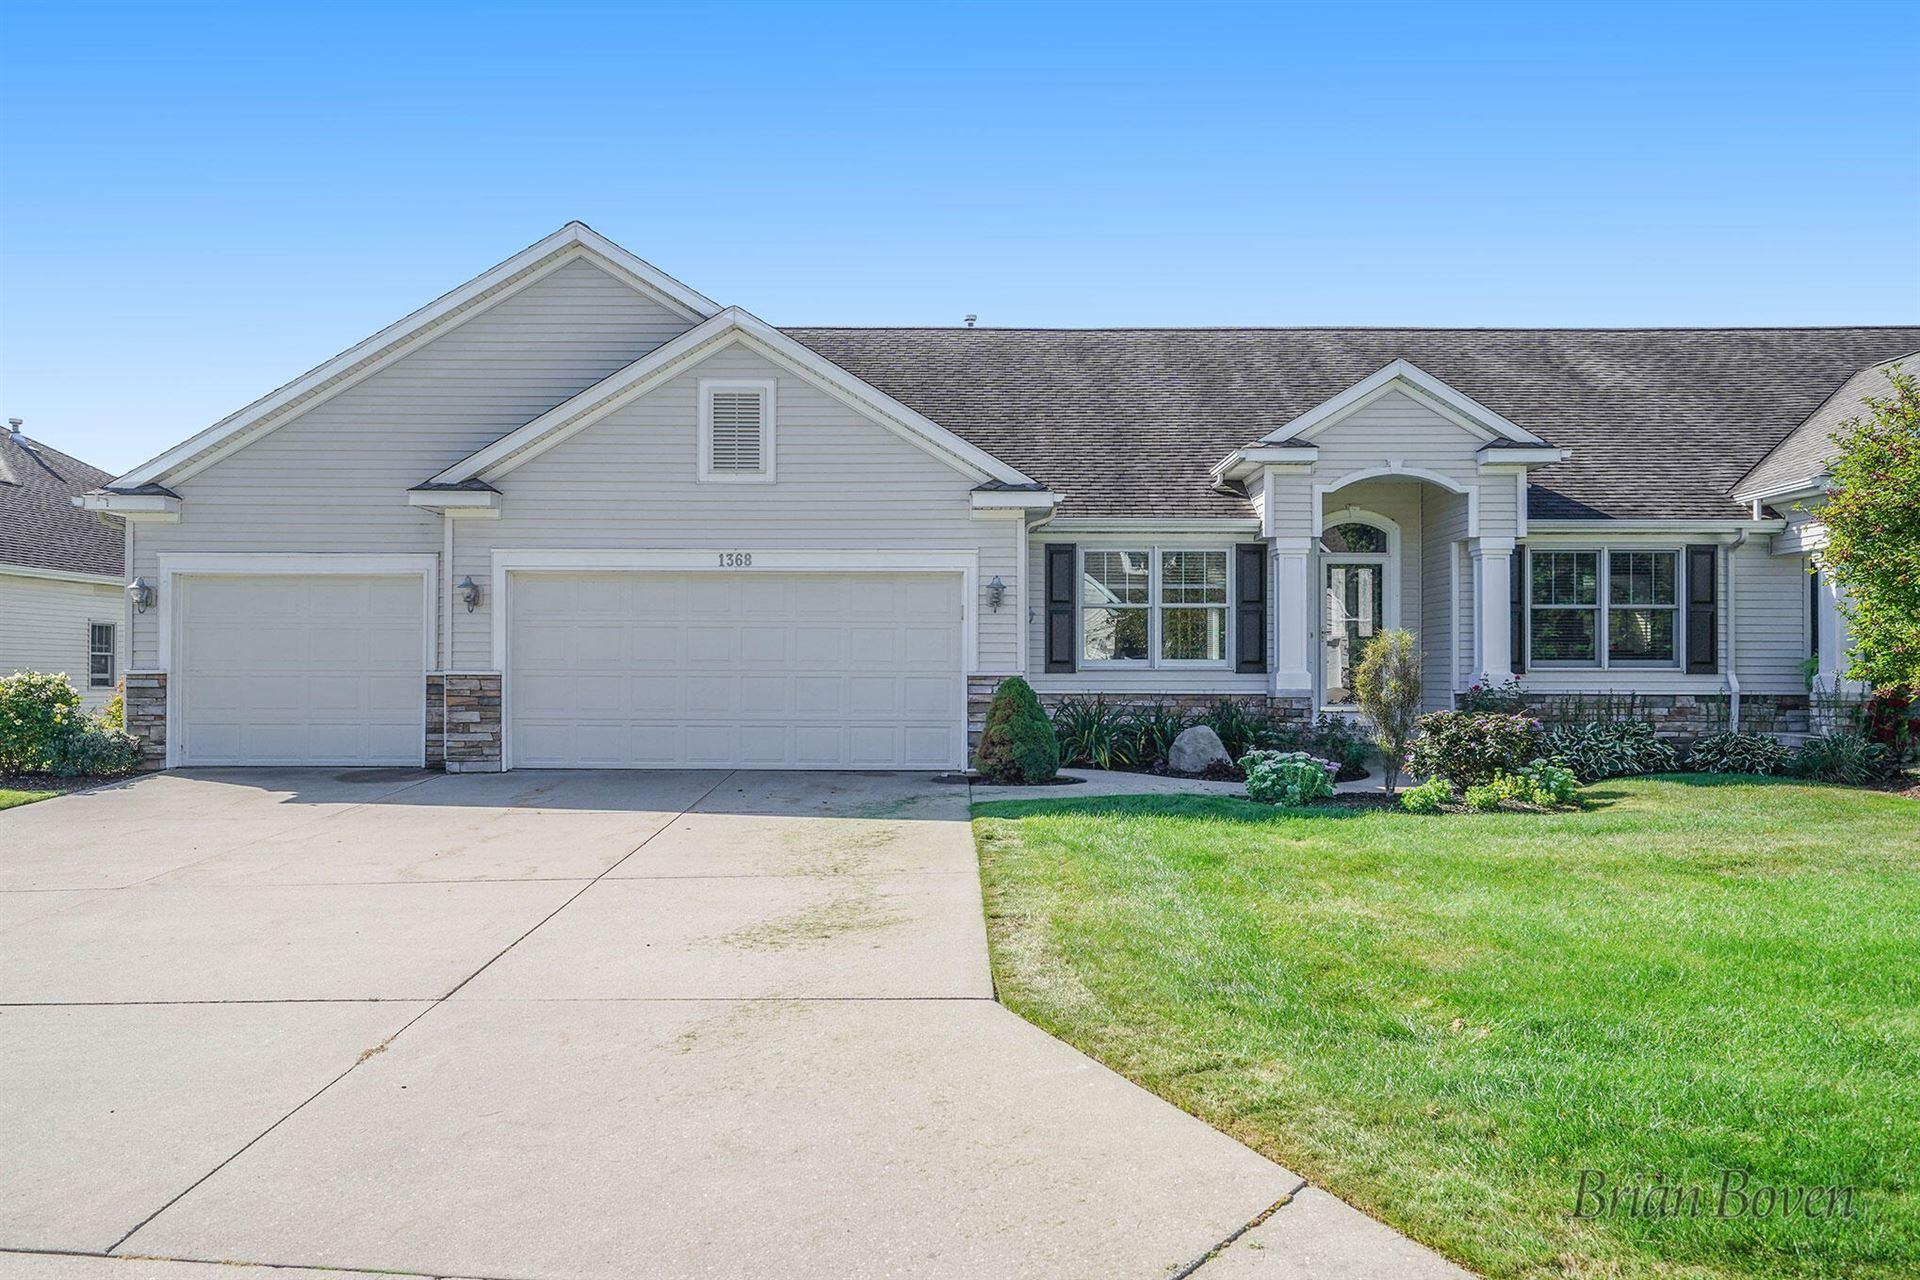 1368 Linwood Drive NW #41, Grand Rapids, MI 49534 - MLS#: 21105064